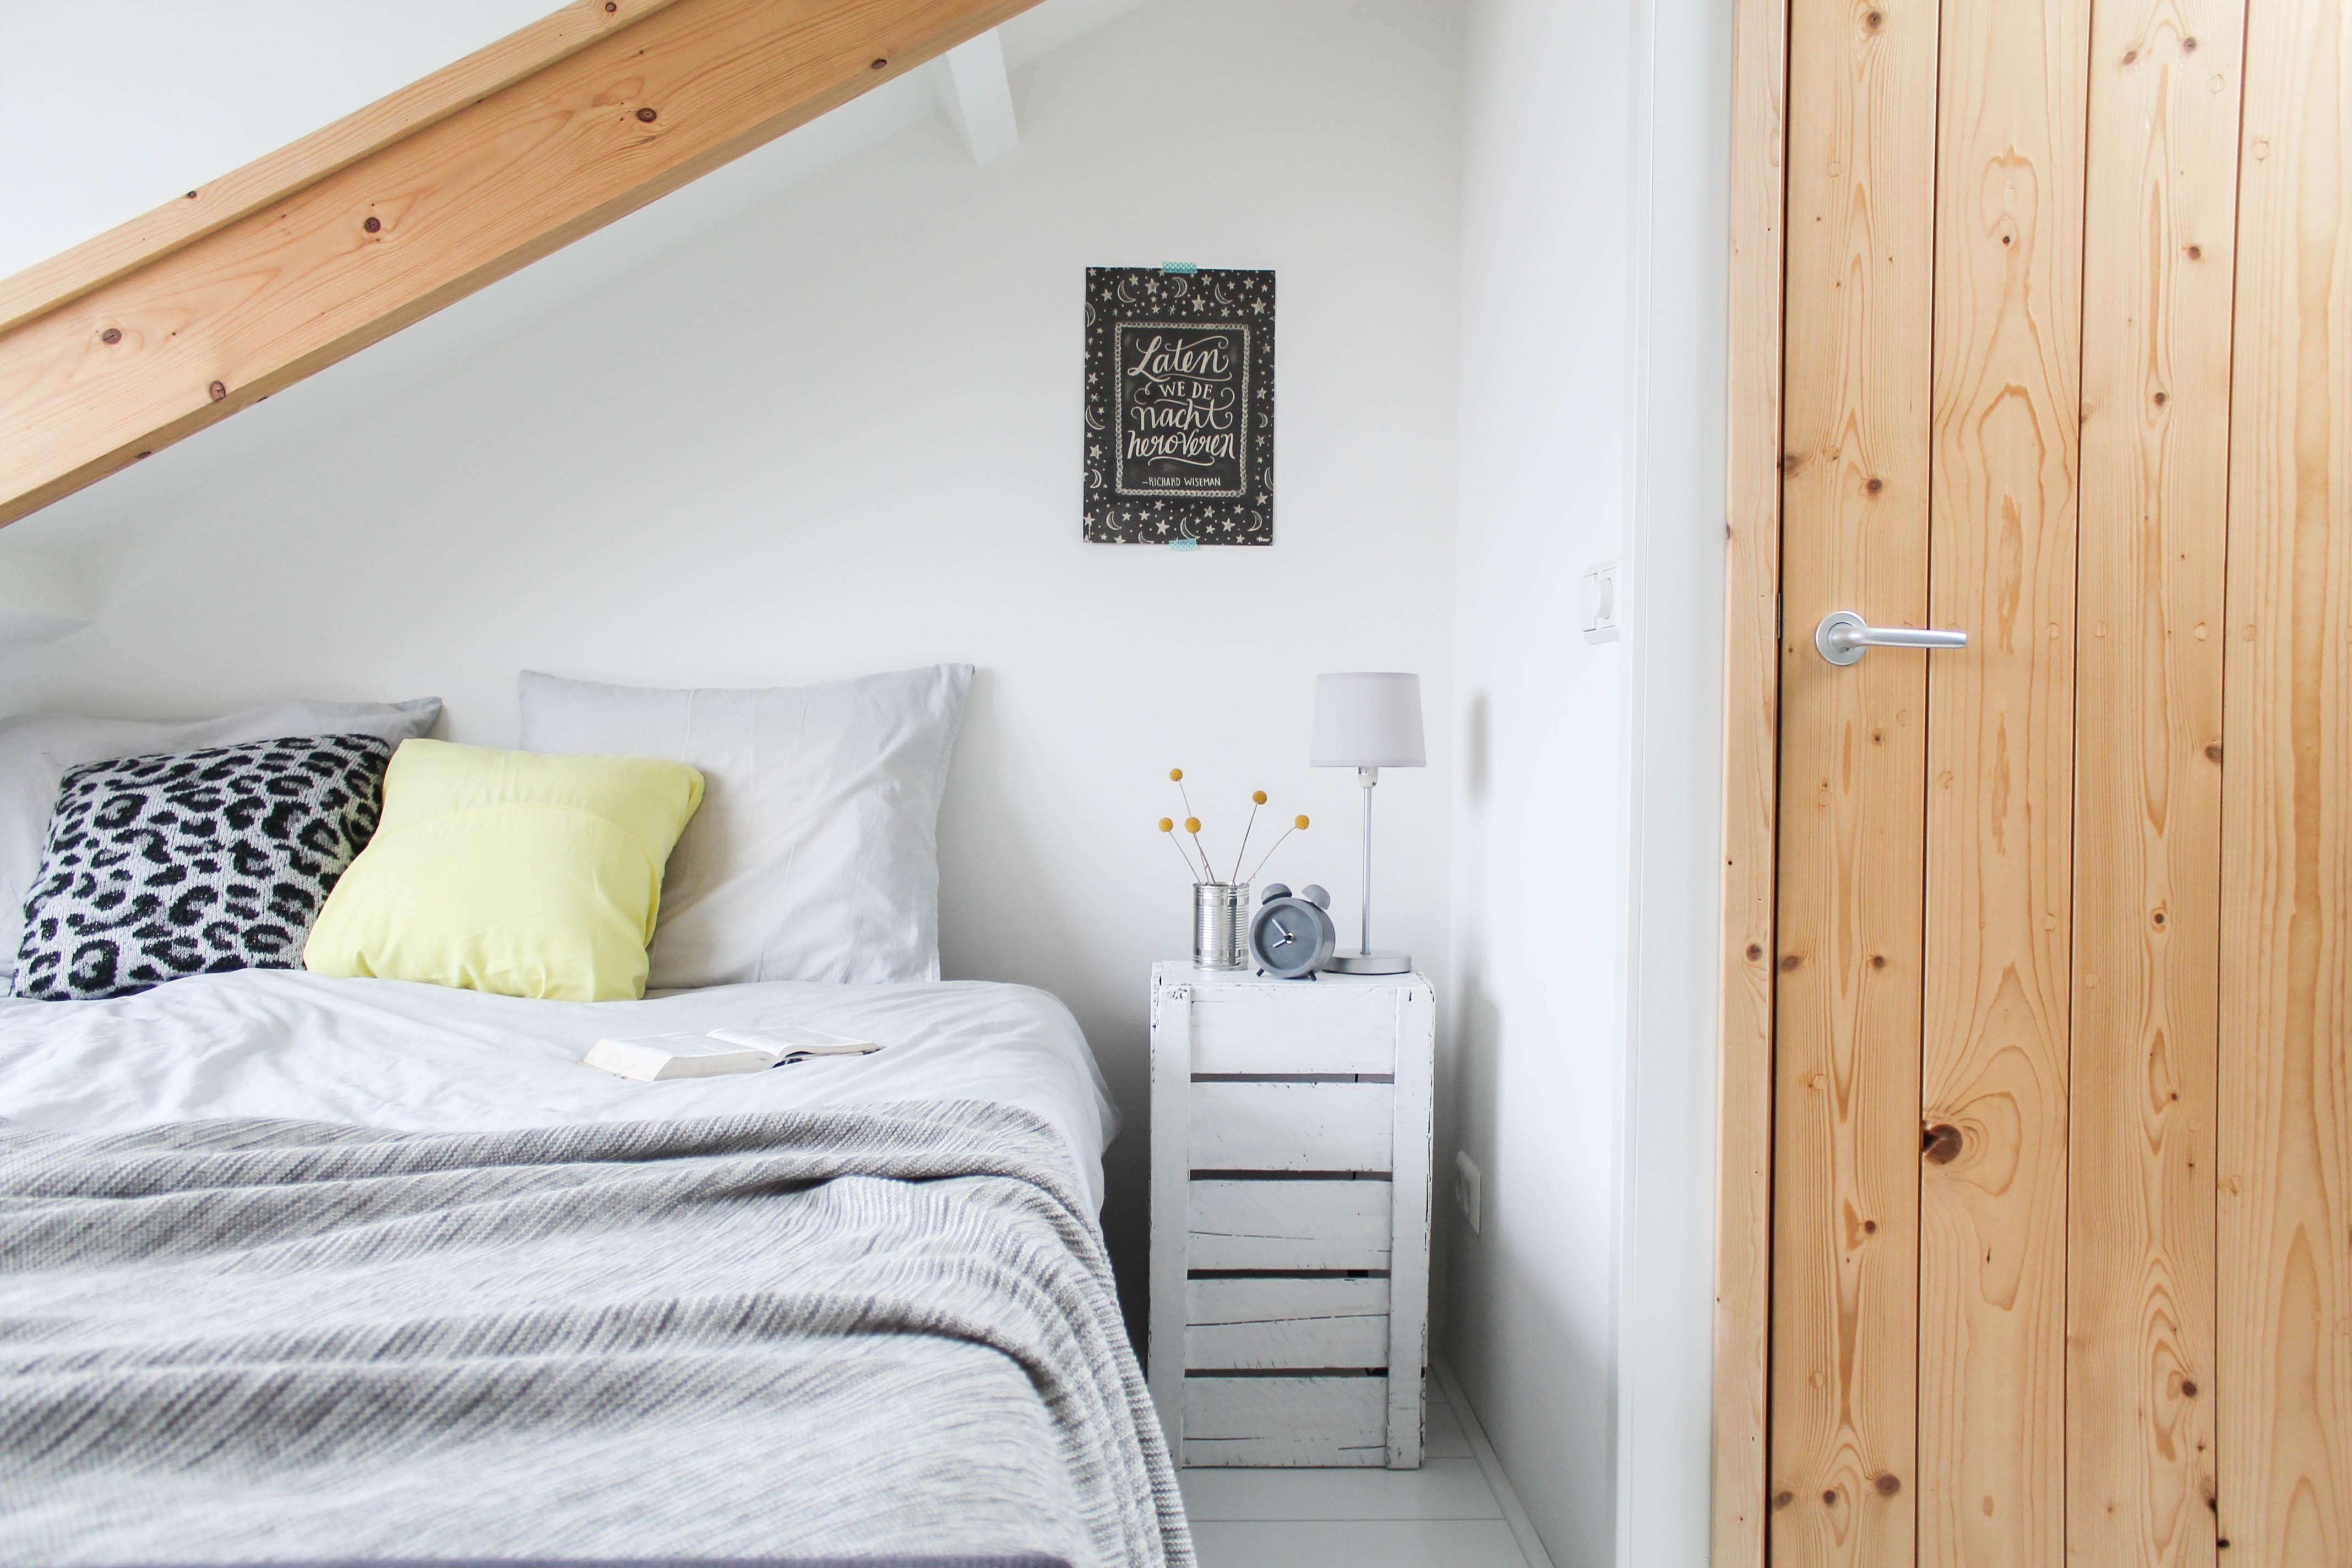 ingebruins-blog-bedroom-autum6